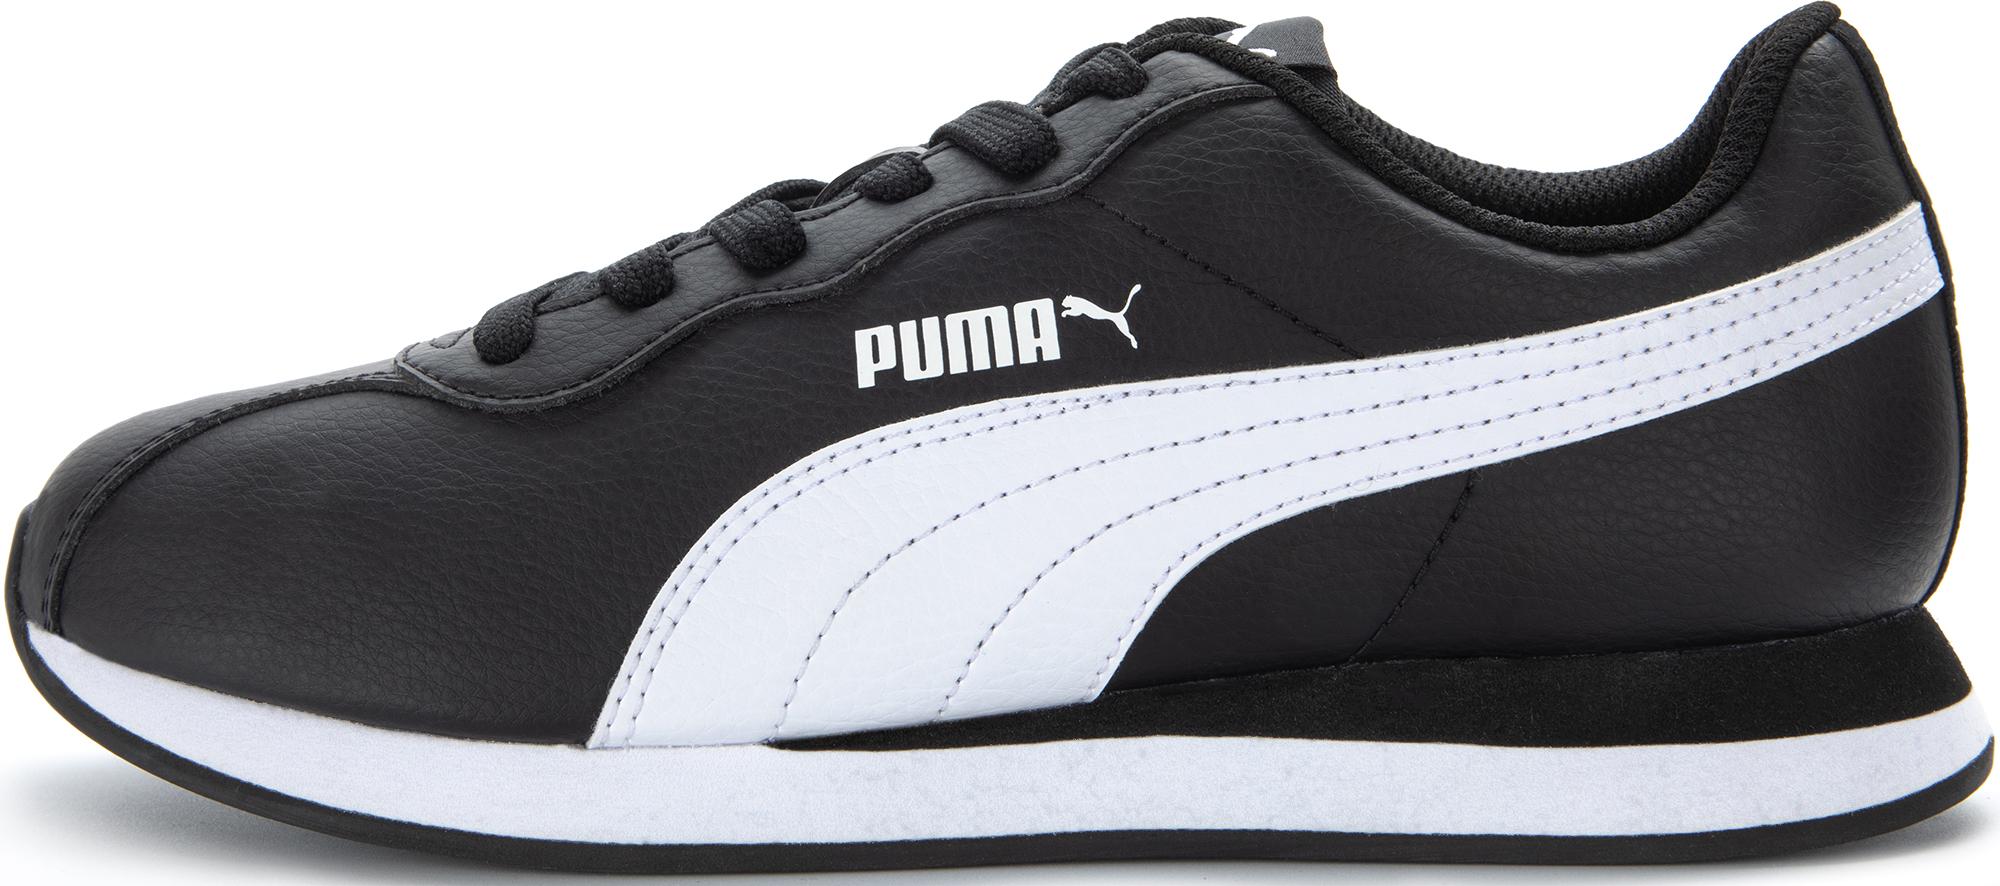 Puma Кроссовки детские Puma Turin II, размер 38